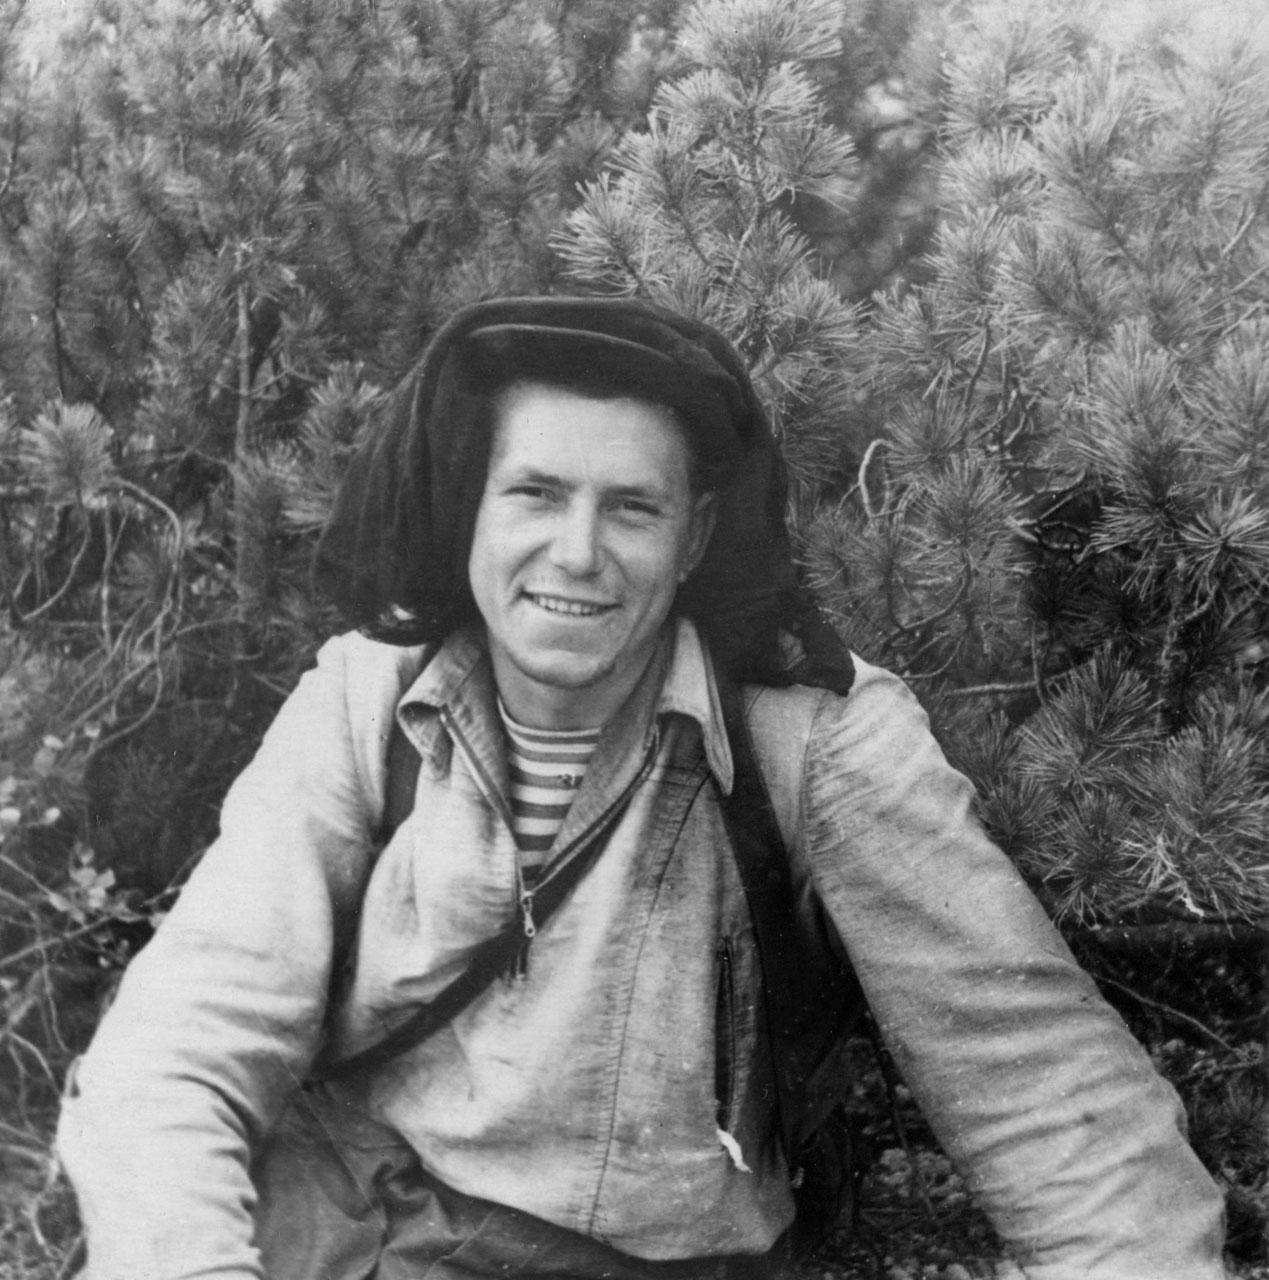 Афанасьев В.И. на маршруте. Фото из архива Елены Афанасьевой-Демчук.